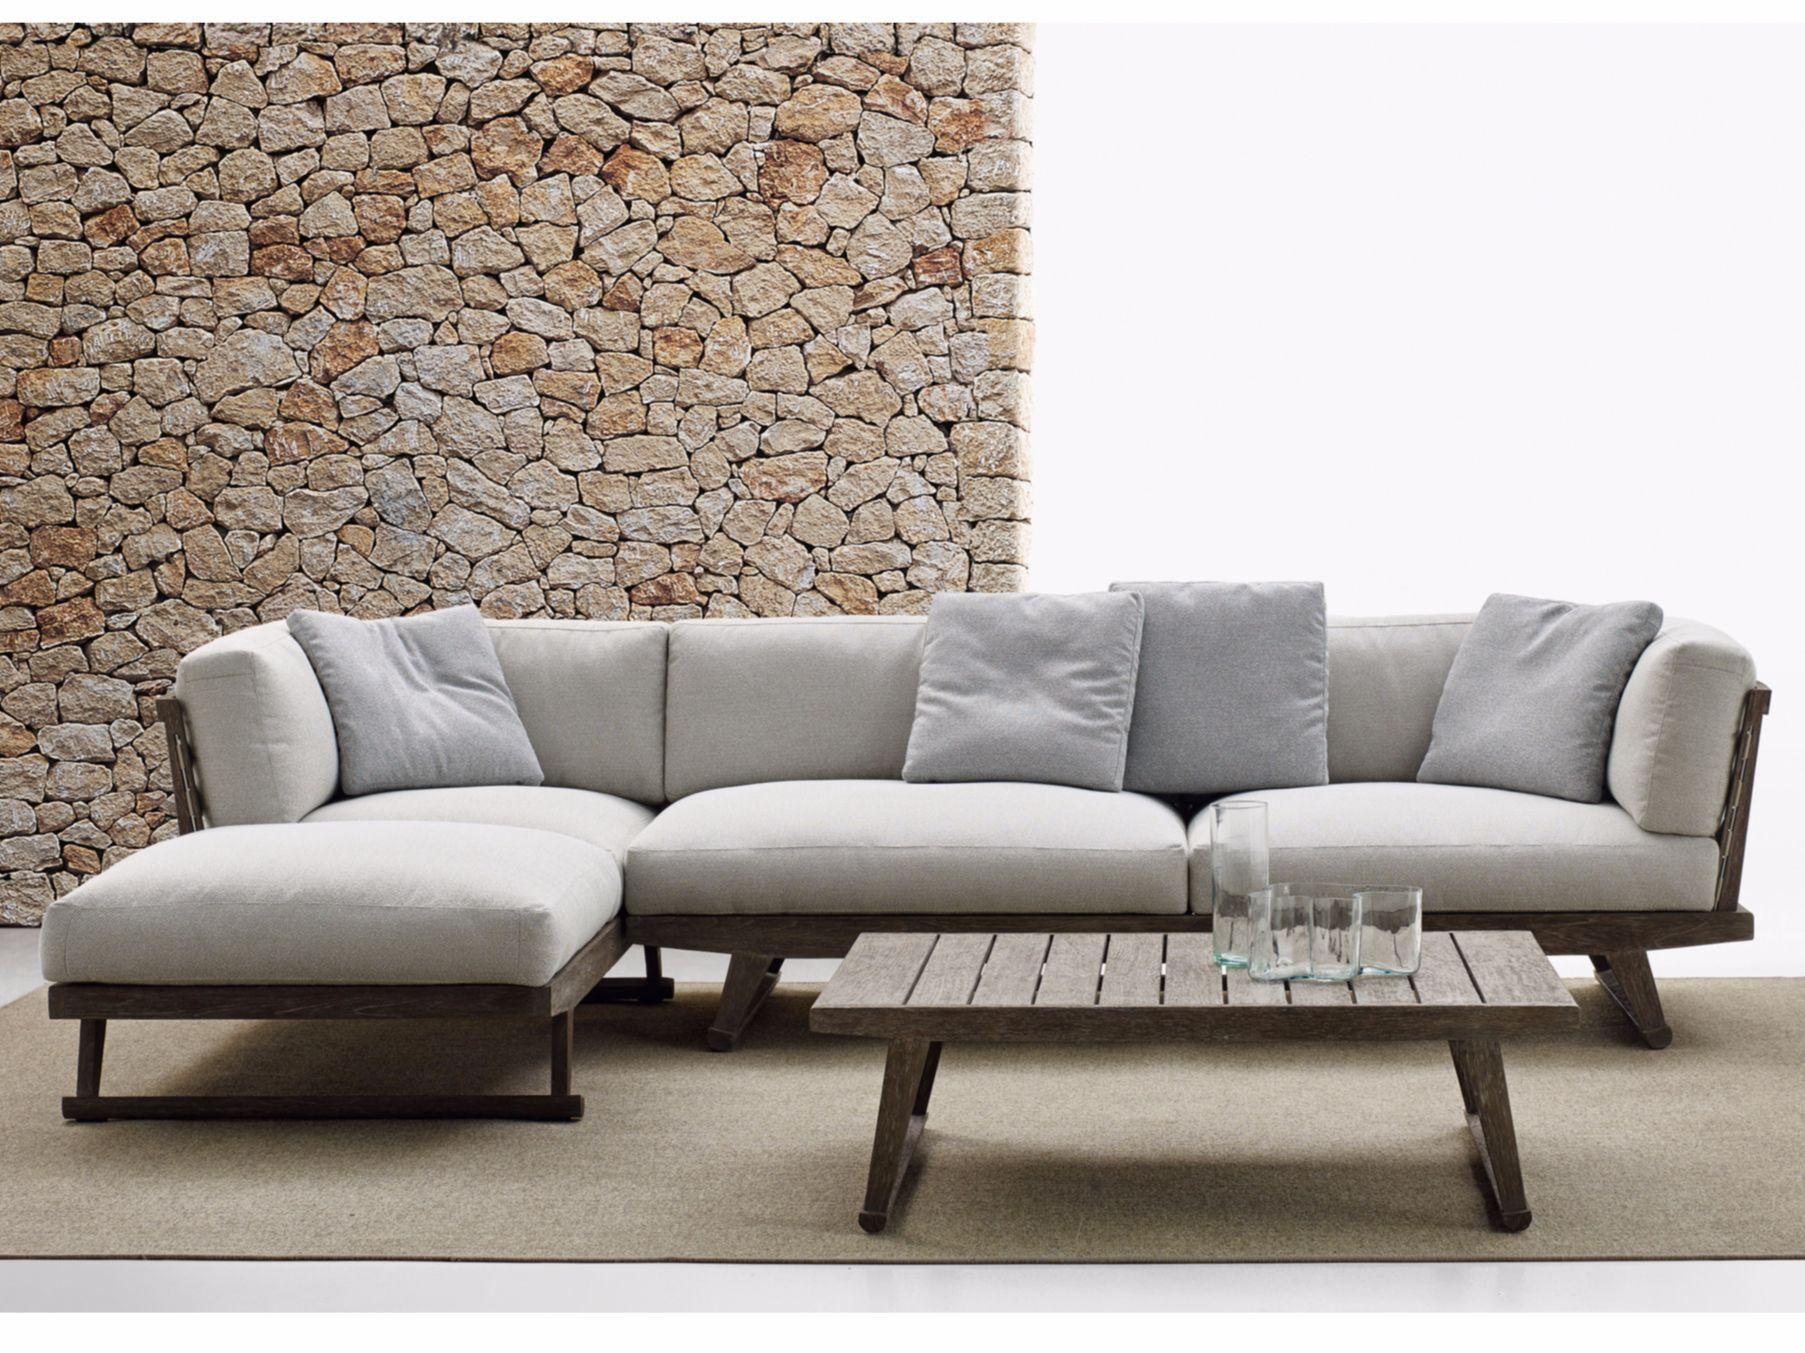 Gio sofa with chaise longue gio collection by b b italia - Medidas de sofas chaise longue ...